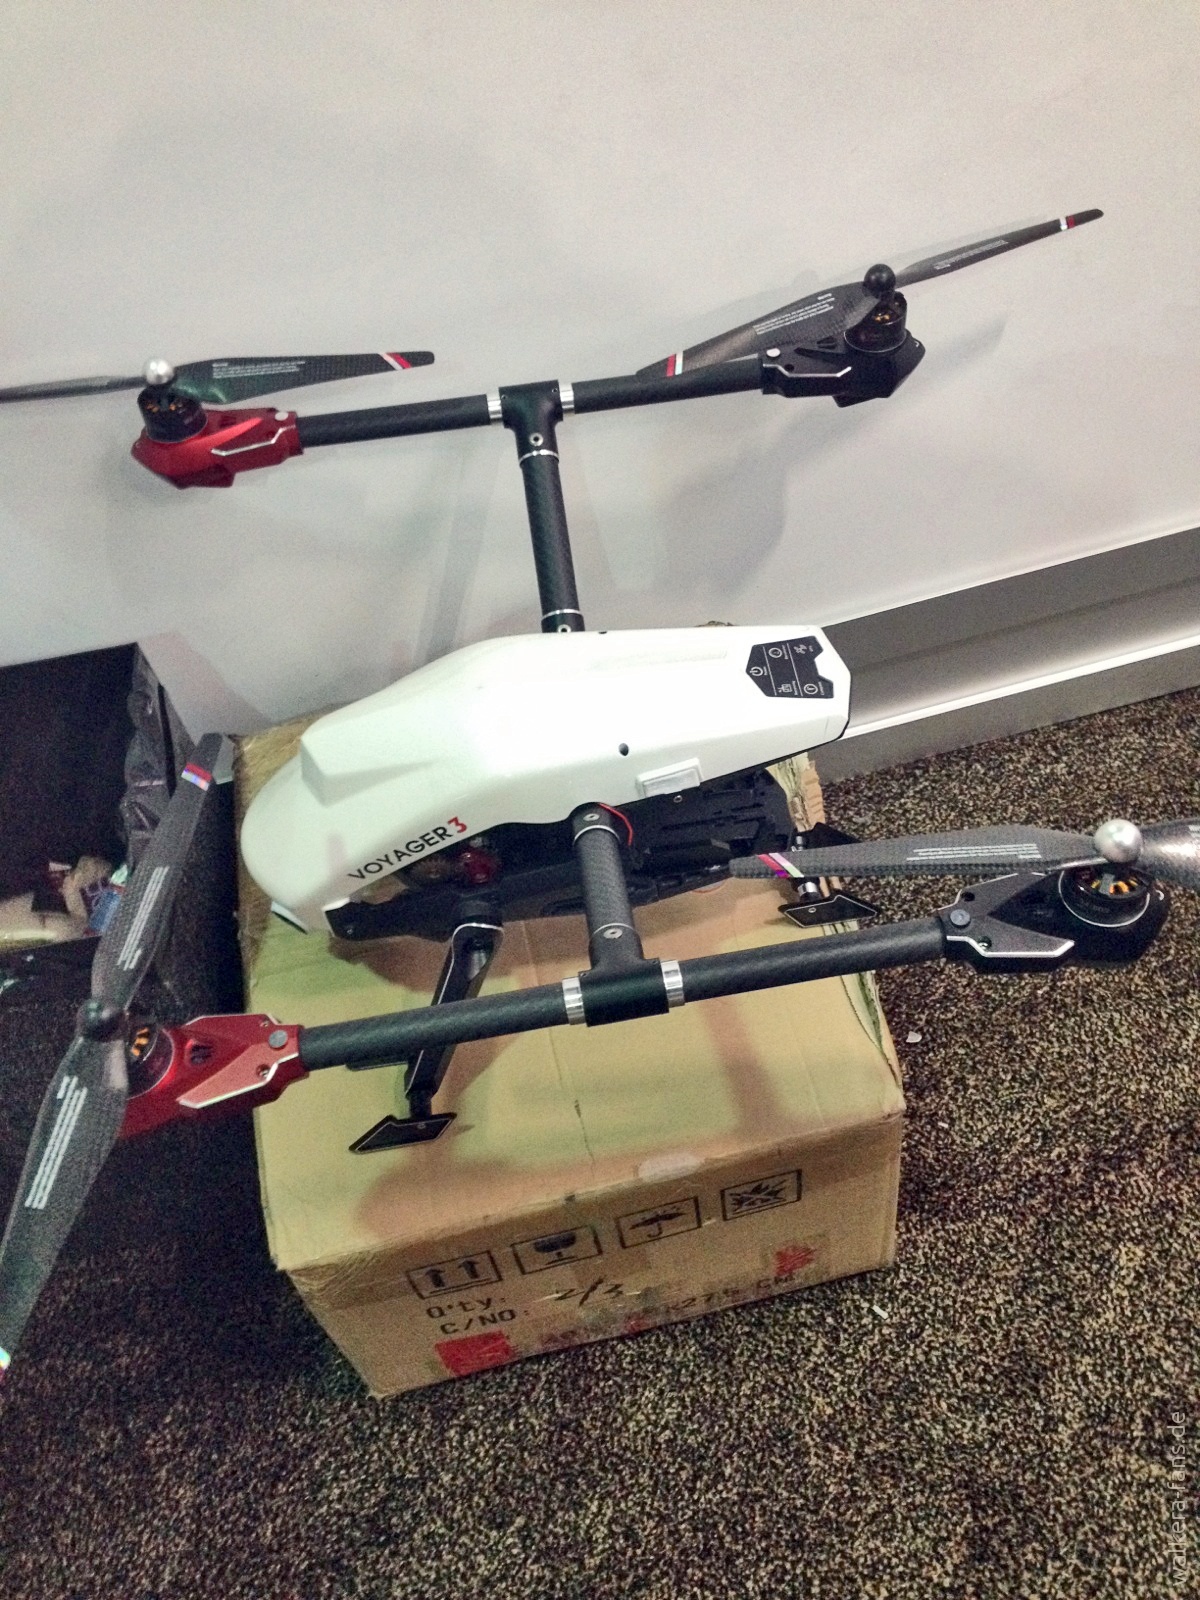 Scout H6 Mantis Voyager 3 Und Andere Walkera Modelle Auf Der Ces Drone Gps Devo F12e G 3d Gimbal Ilook With Camera Putih Prototyp Fotos